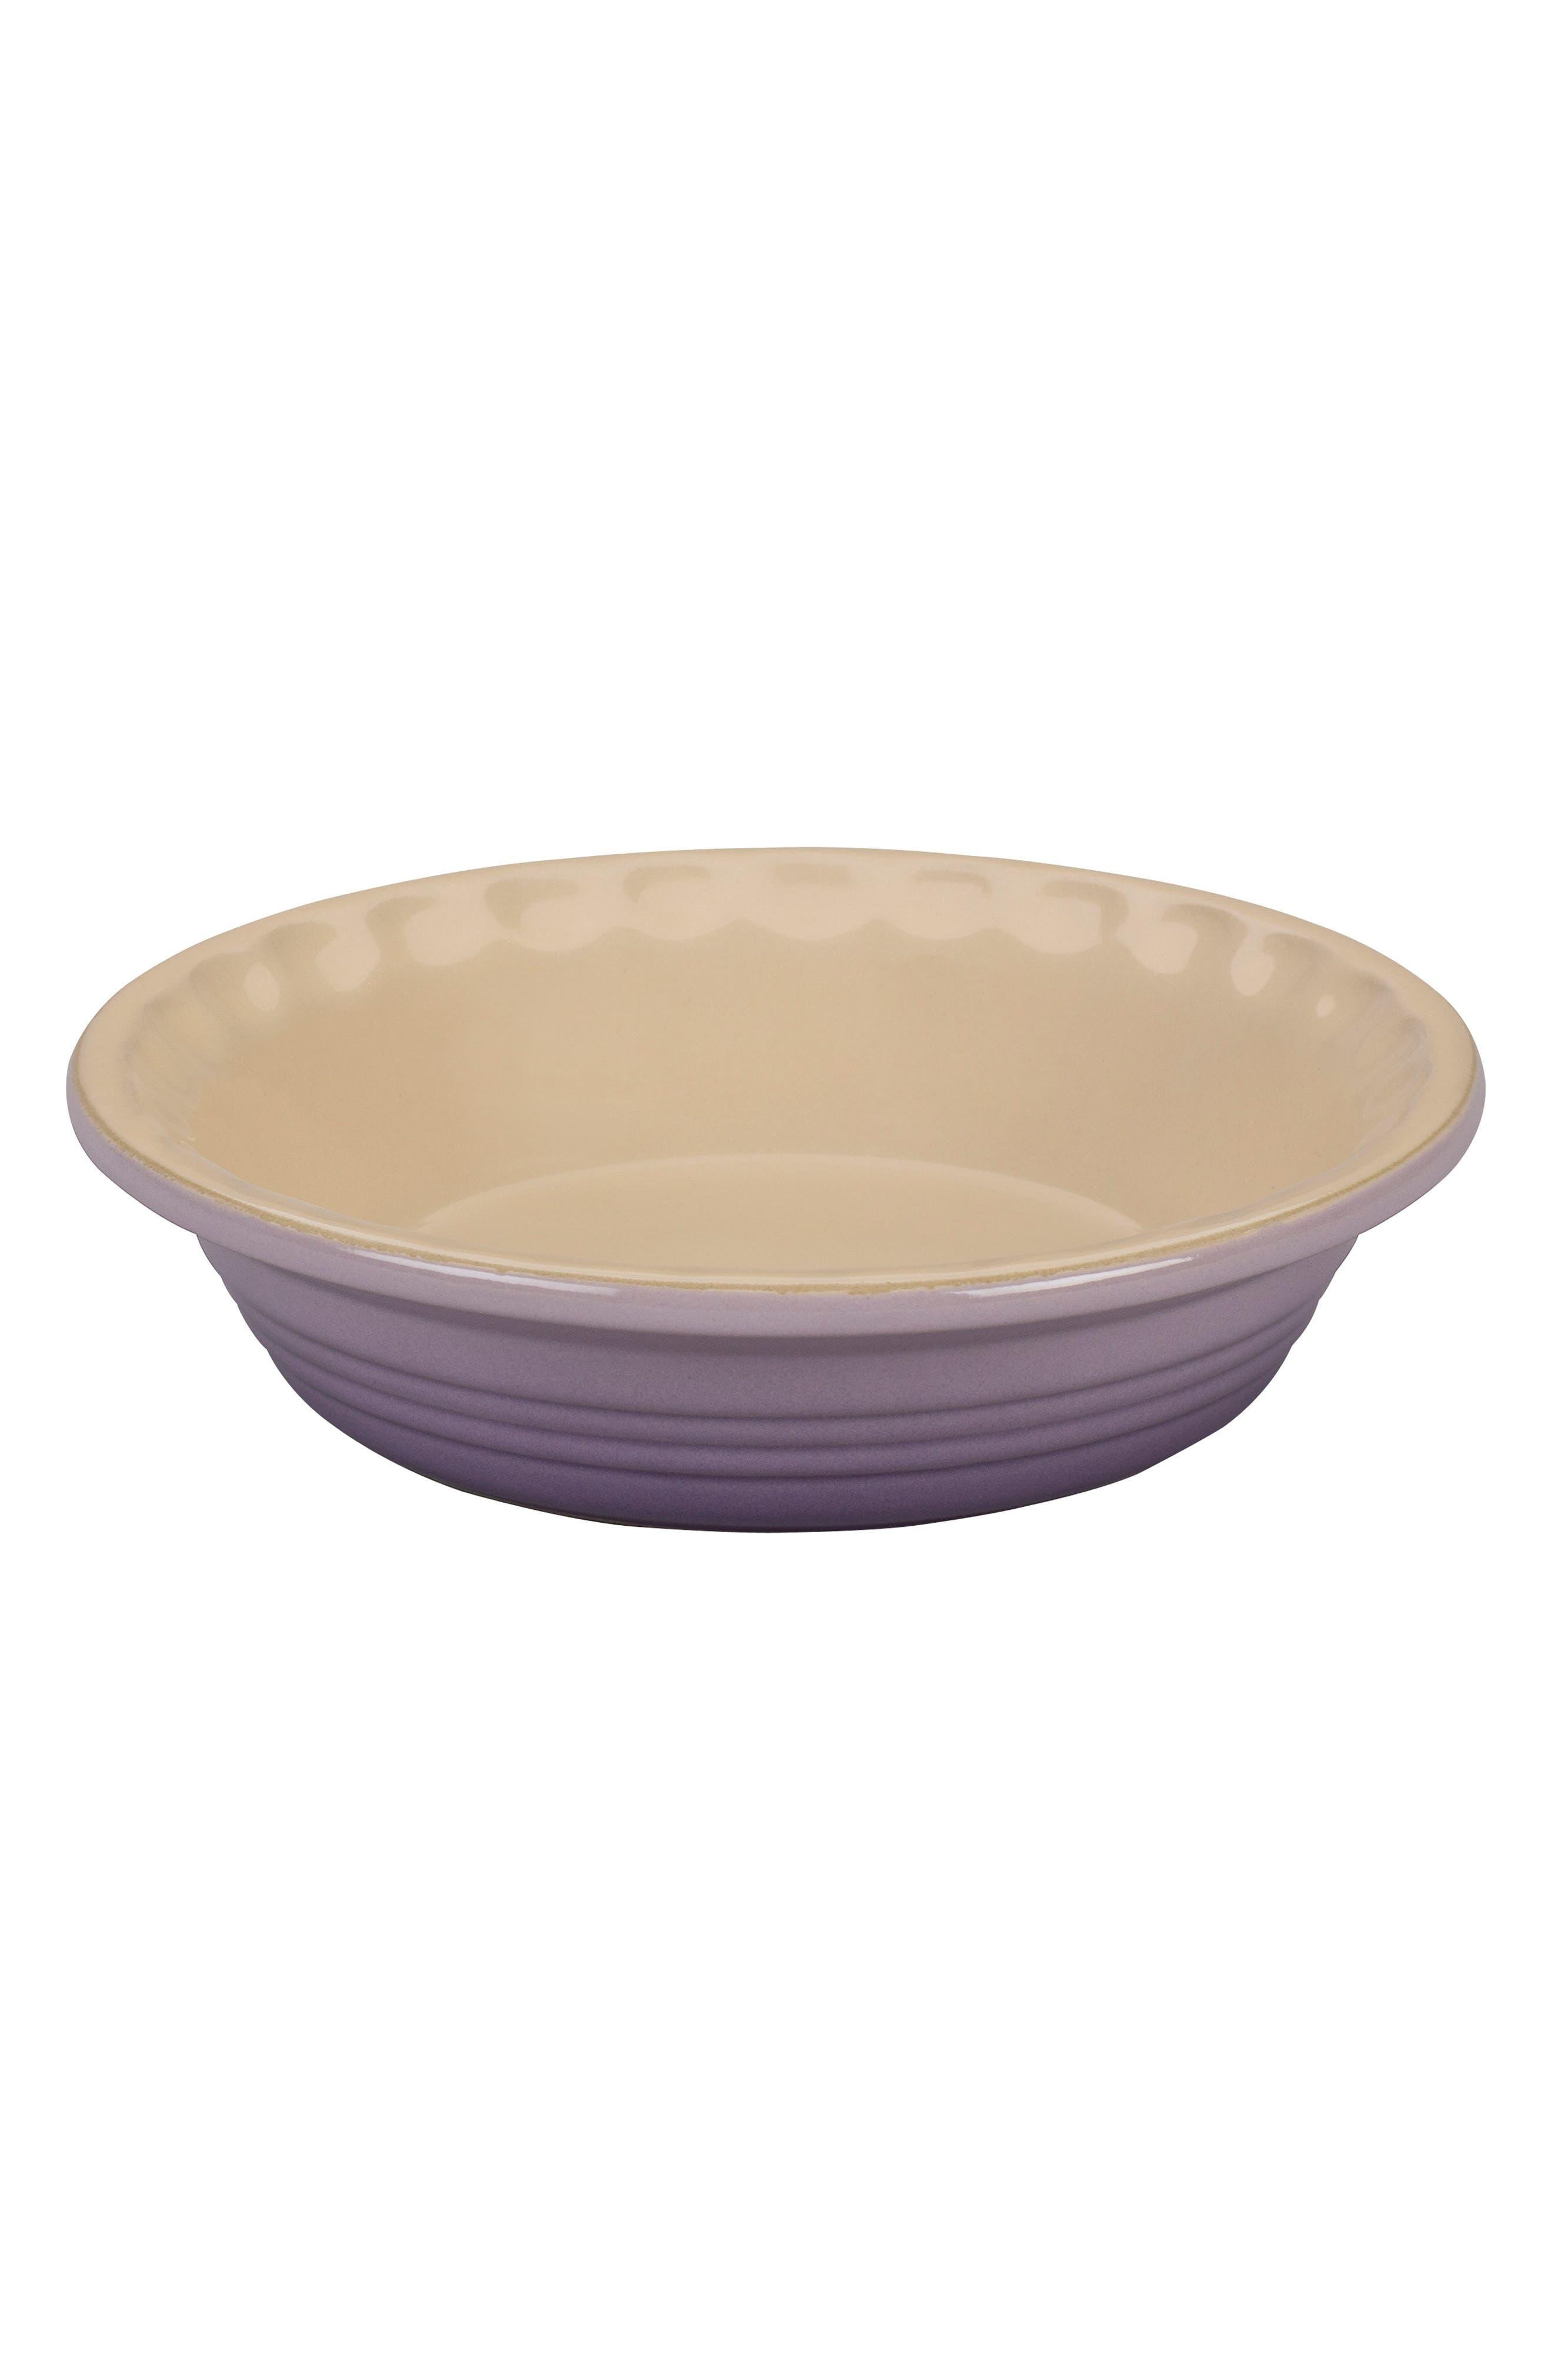 Le Creuset Heritage Enameled Stoneware Petite Pie Dish